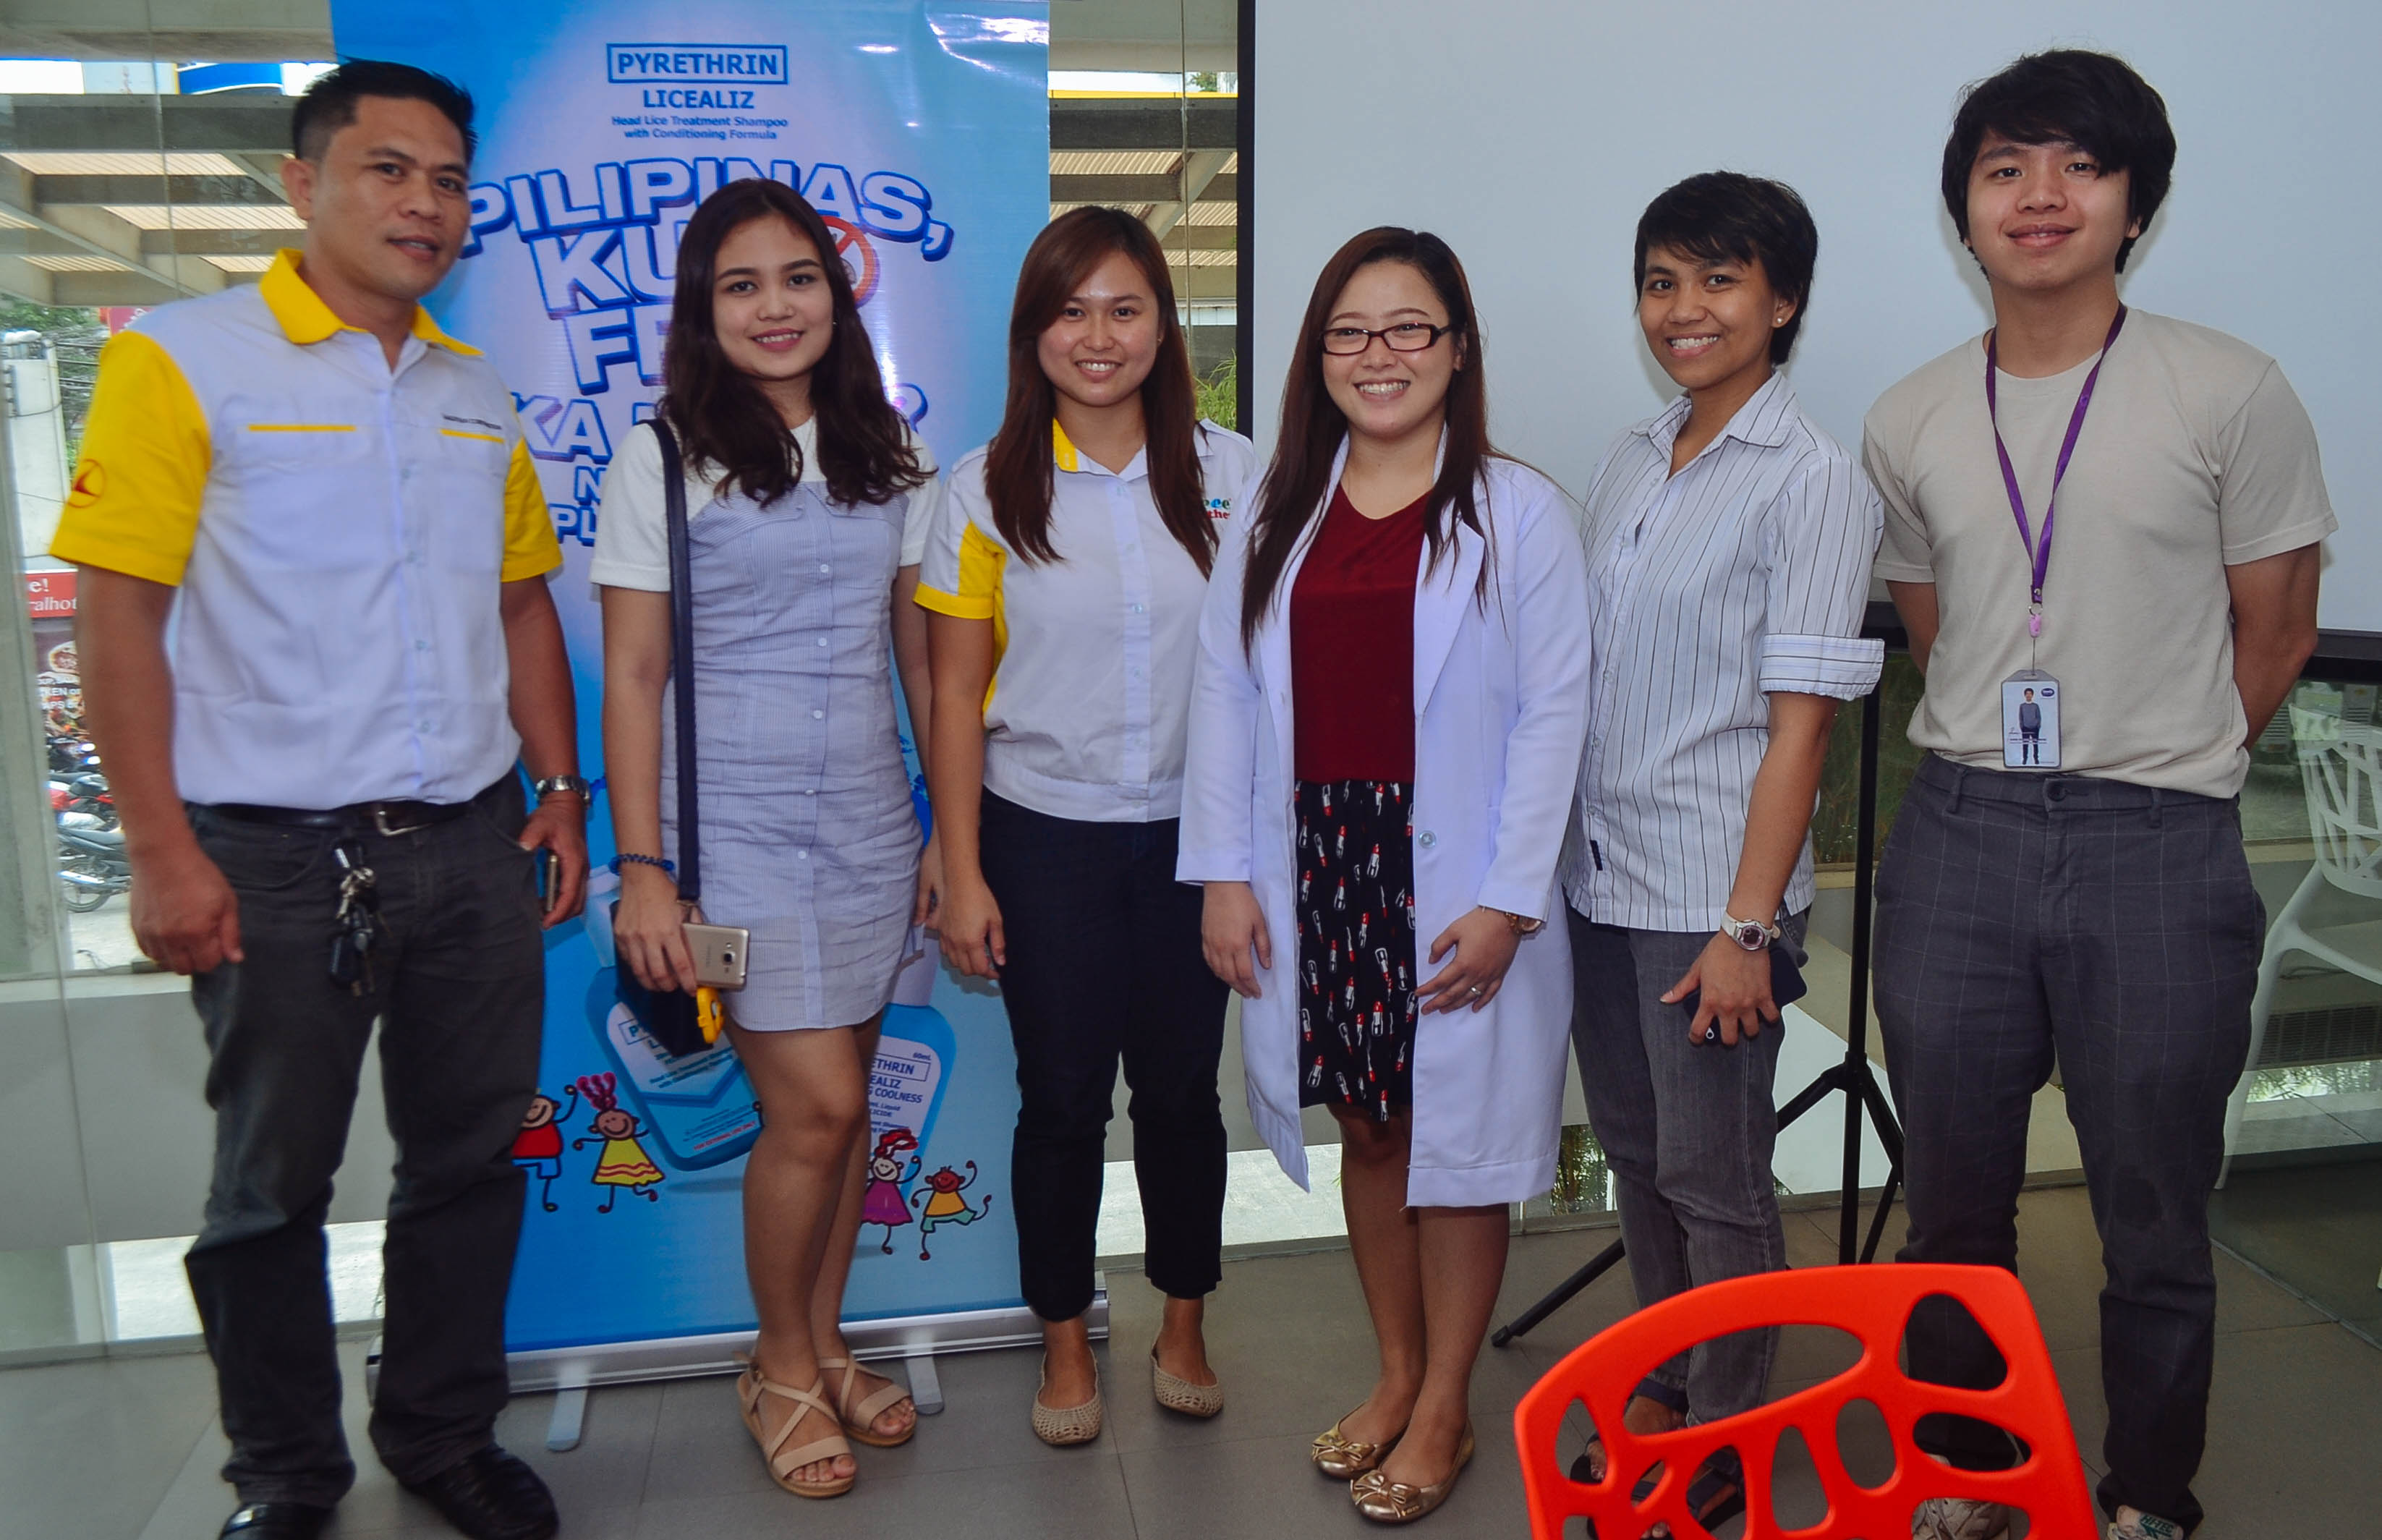 Licealiz Campaign Kilusang Kontra Kuto Team